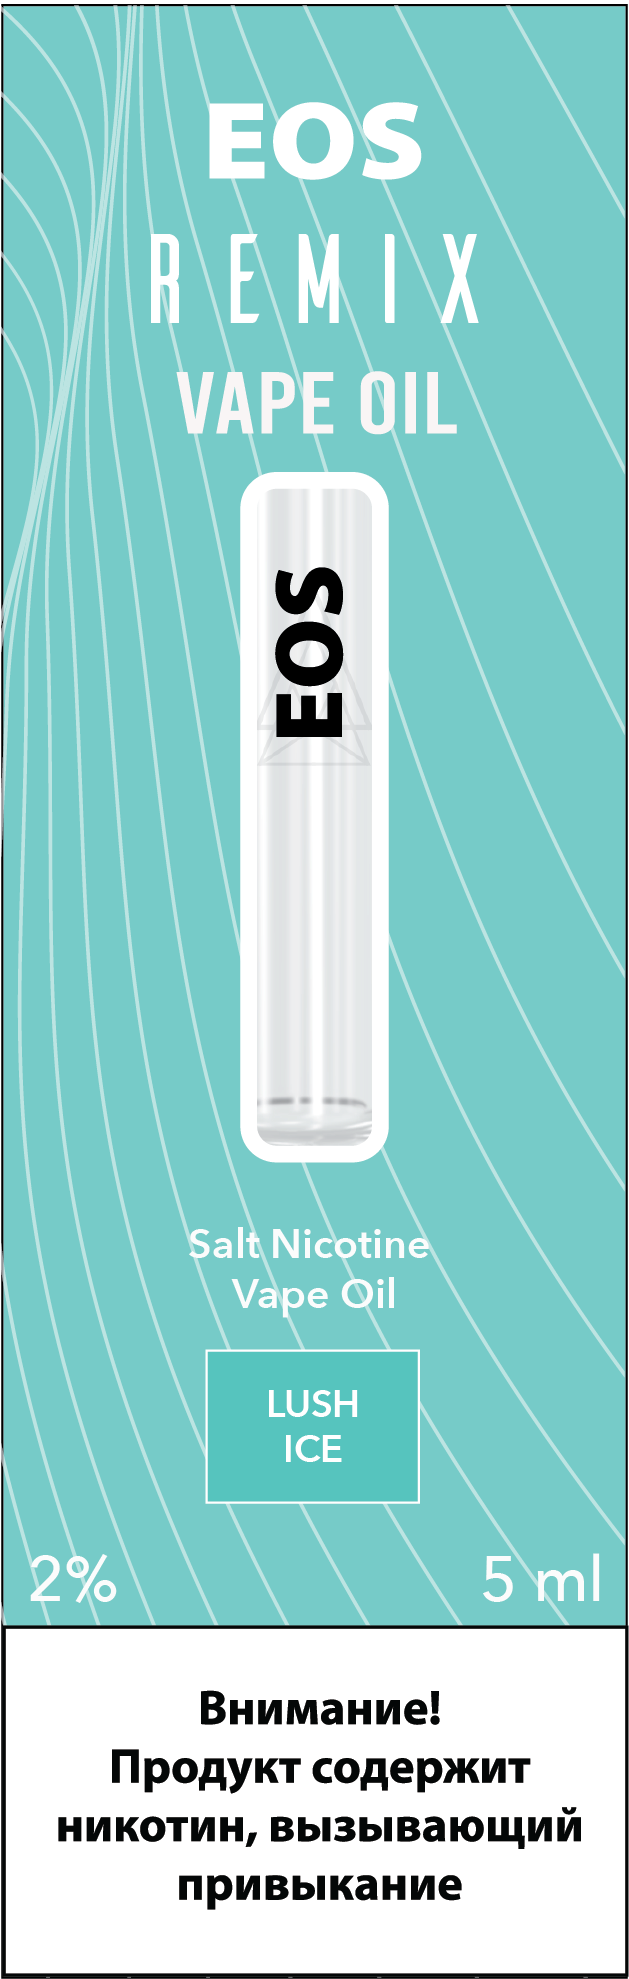 EOS REMIX SALT NIC LUSH ICE 2% 5ml